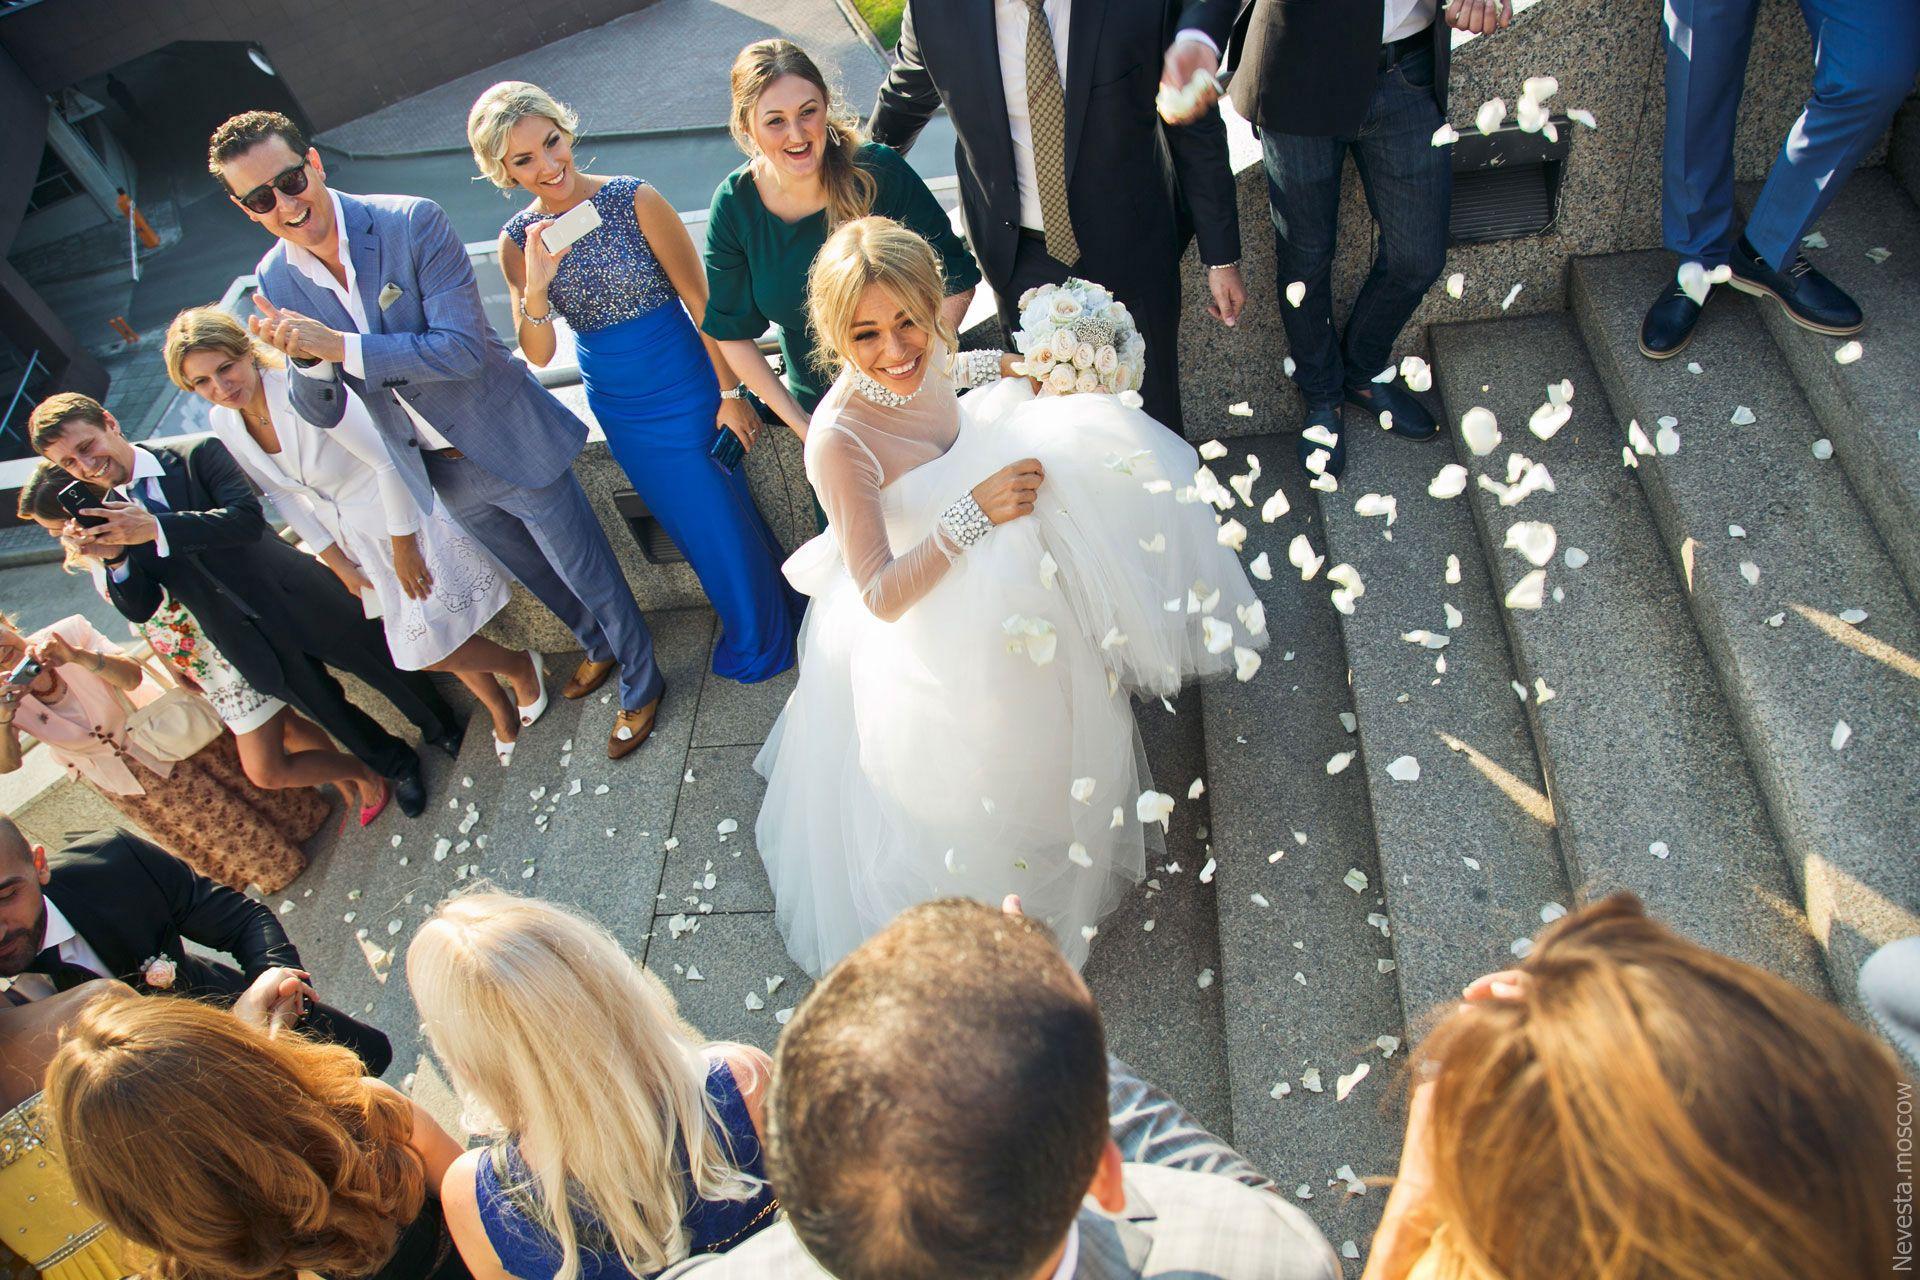 Свадьба Анны Хилькевич и Артура Волкова, фото 10